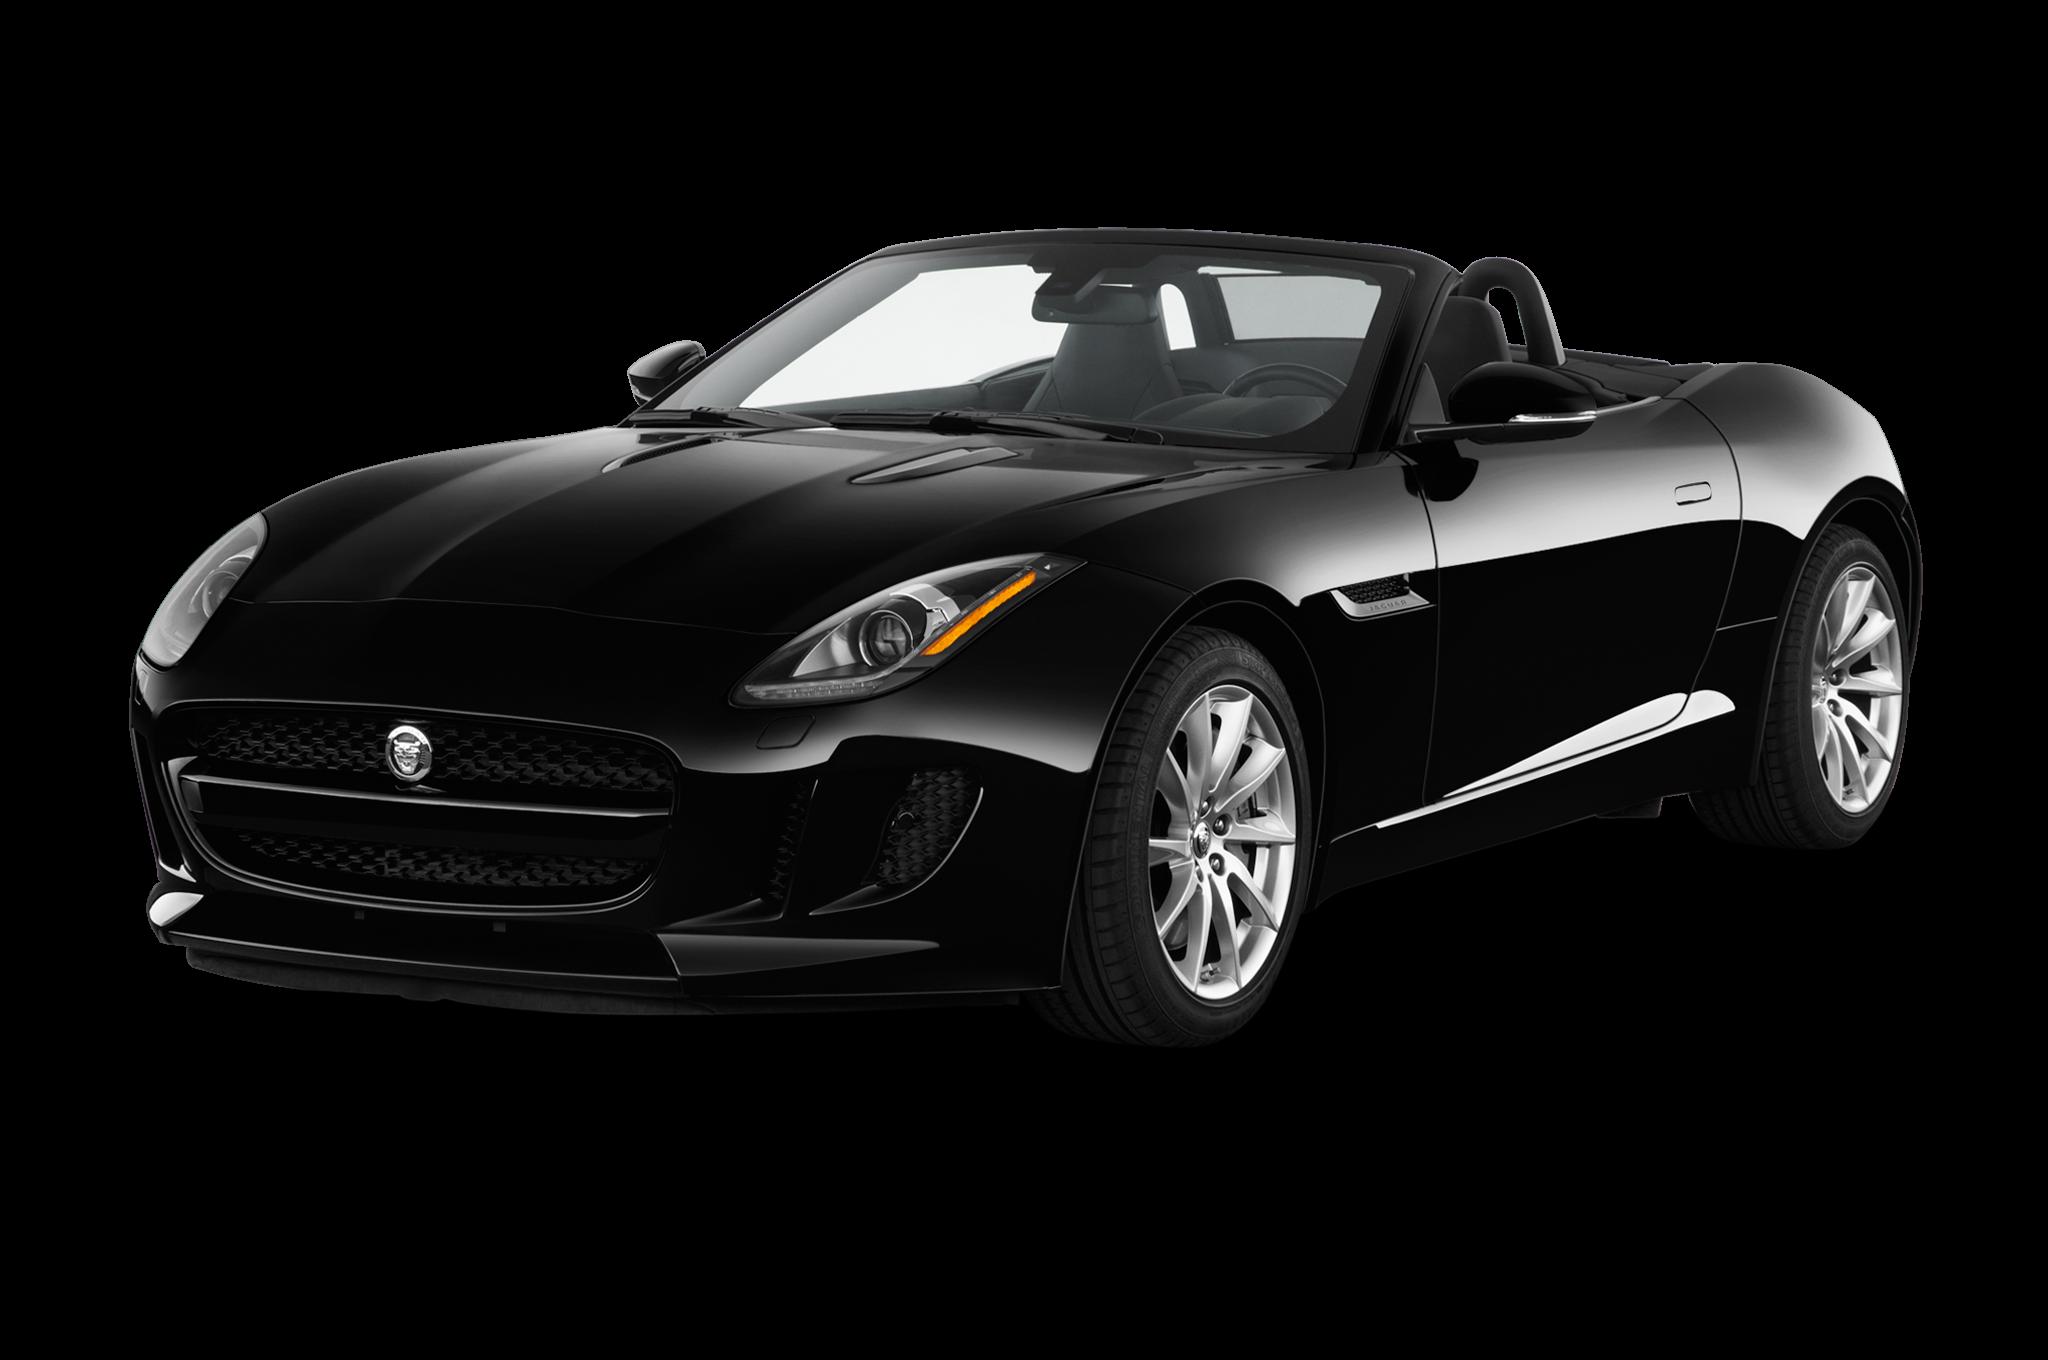 svr jaguar type watch f convertible exterior and drive